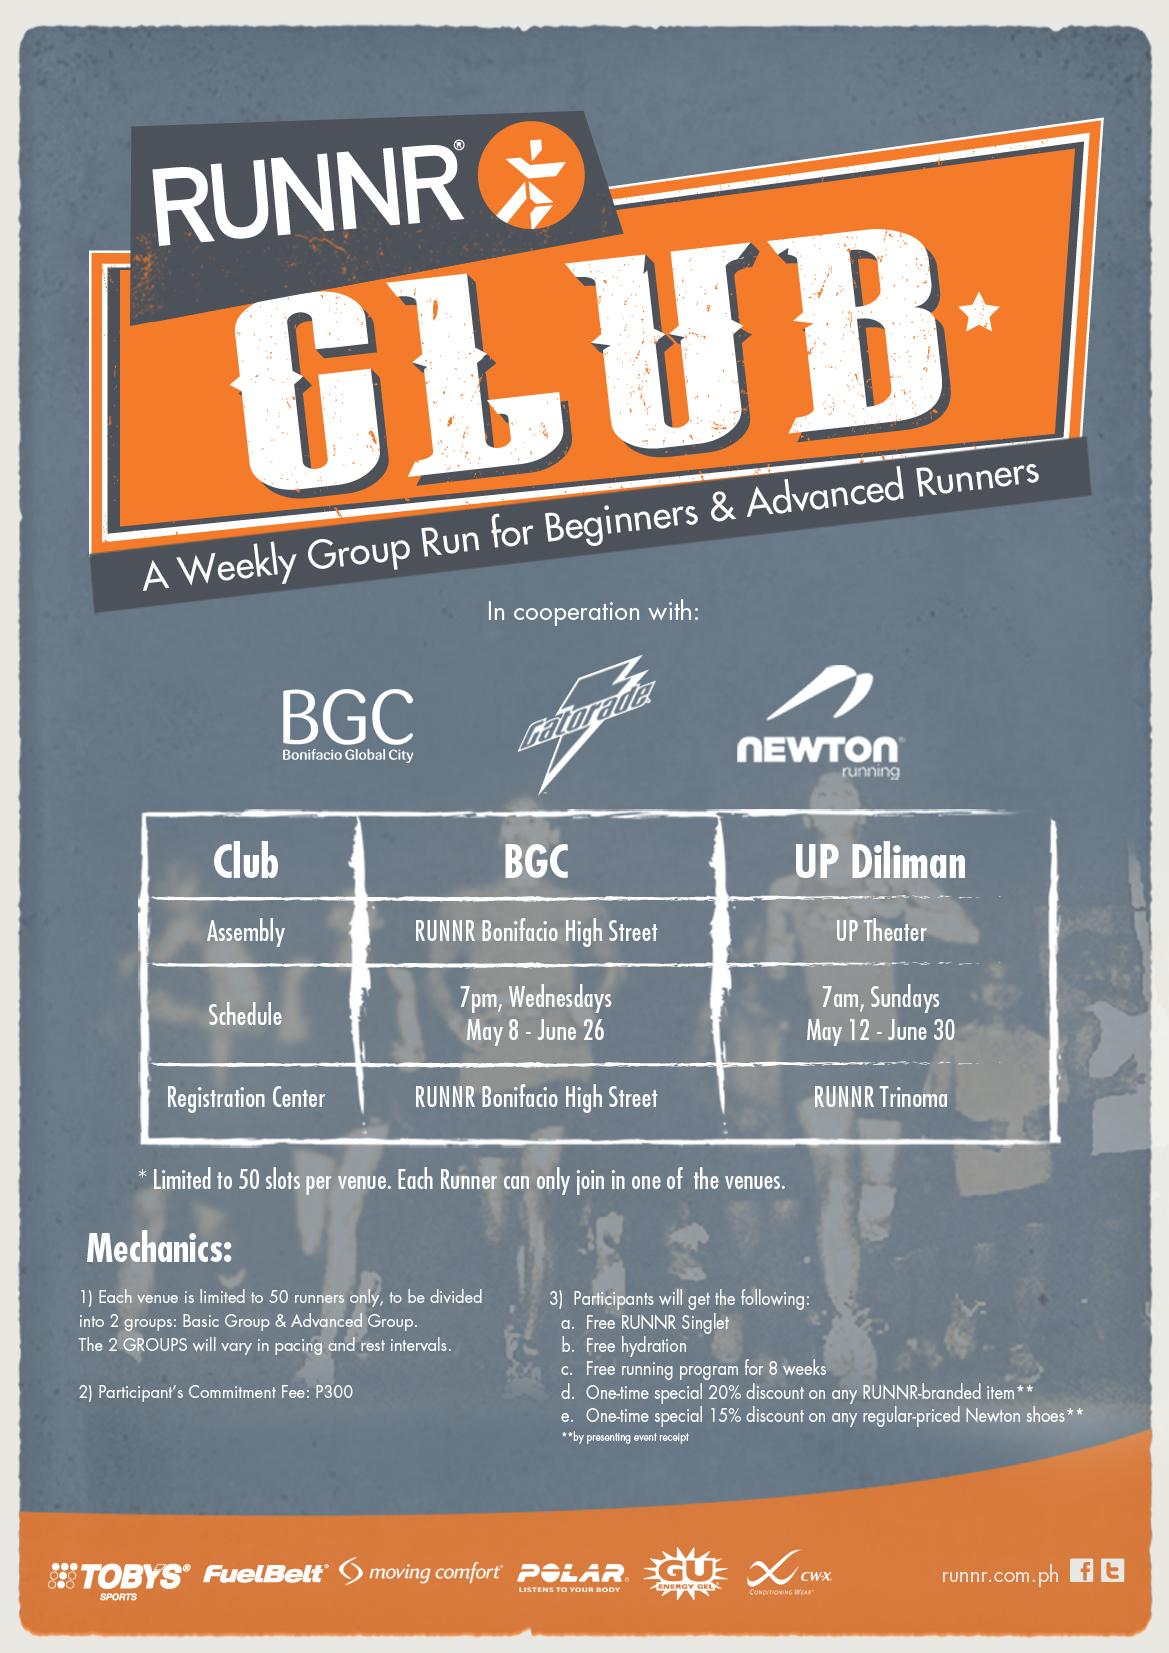 runnr-club-poster-design